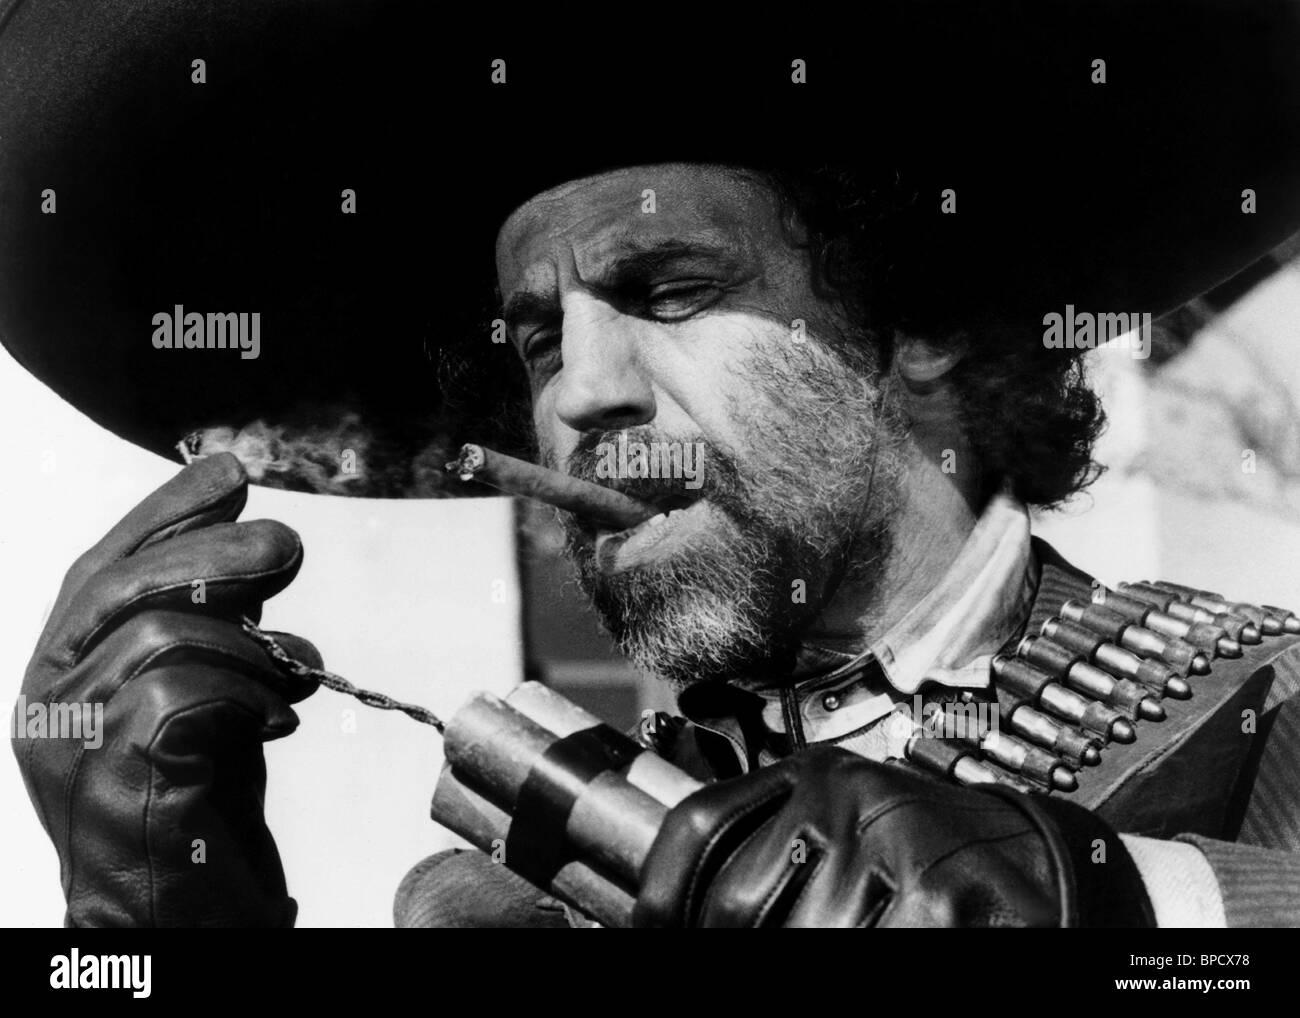 ALFONSO ARAU !THREE AMIGOS! (1986) - Stock Image